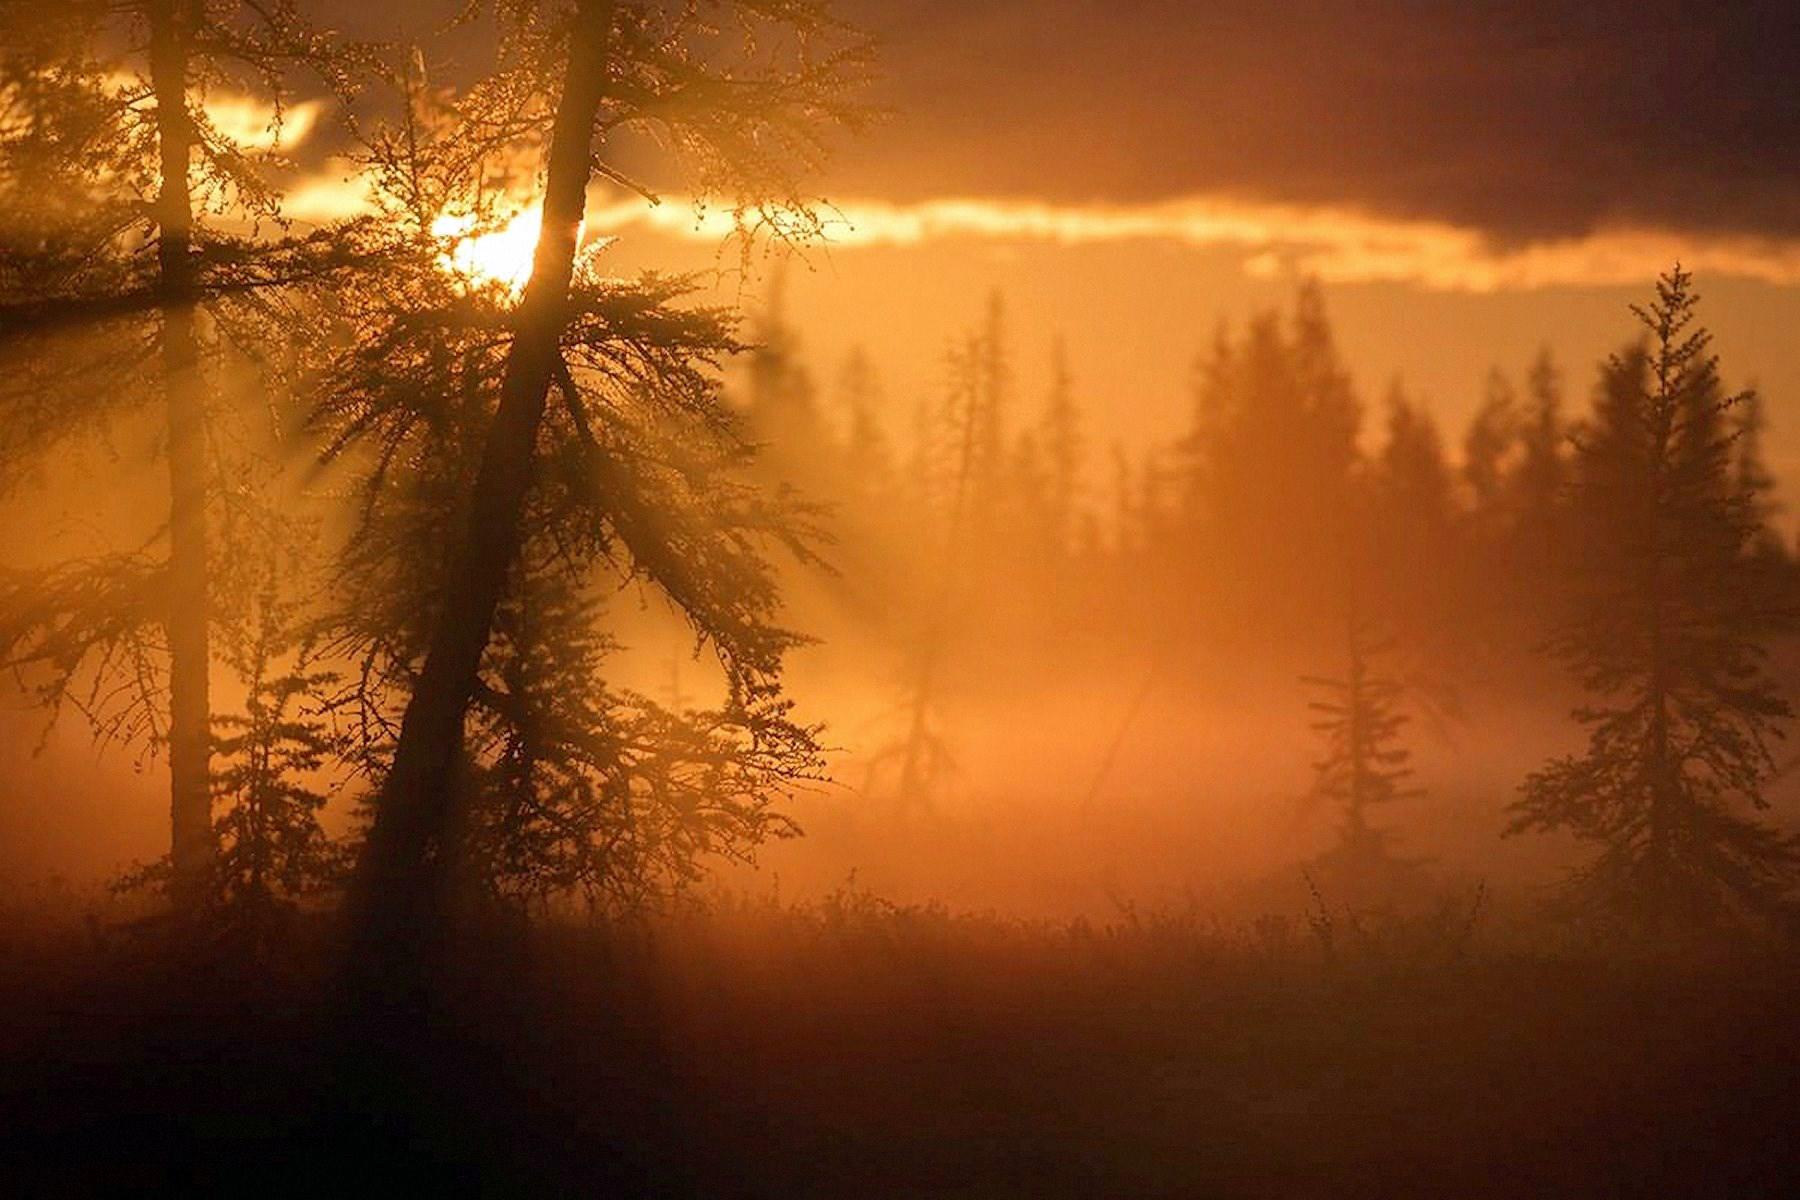 00 Andrei Snegirev. Dawn in the Yamalo-Nenets Autonomous Okrug. 2015